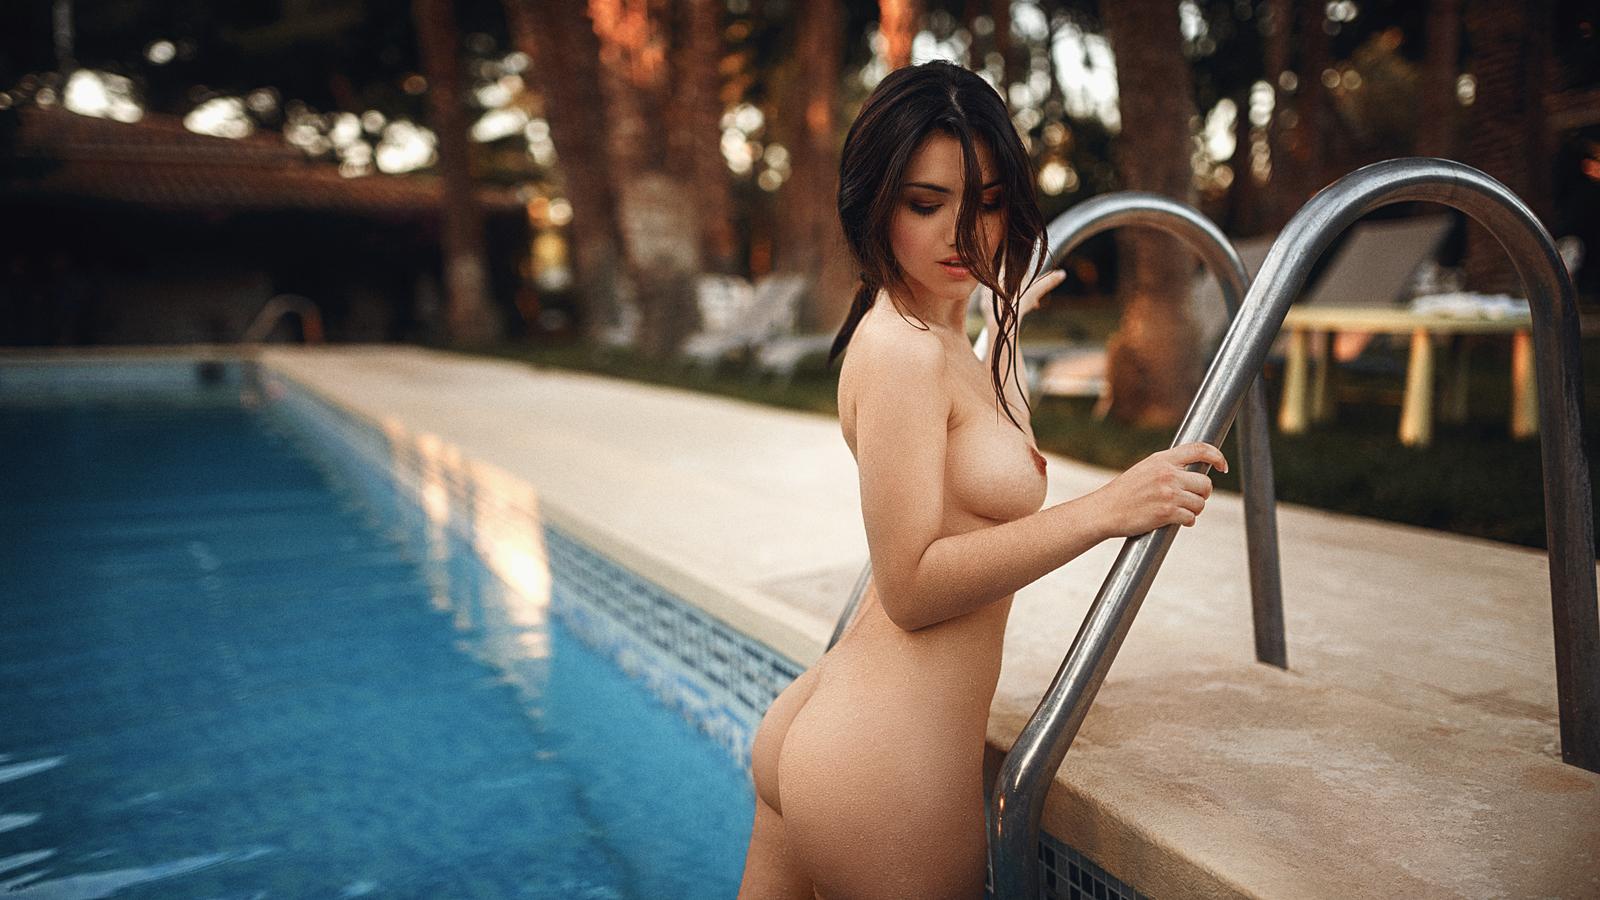 delaia-gonzalez-day-out-nude-art-erotic-georgy-chernyadyev-10